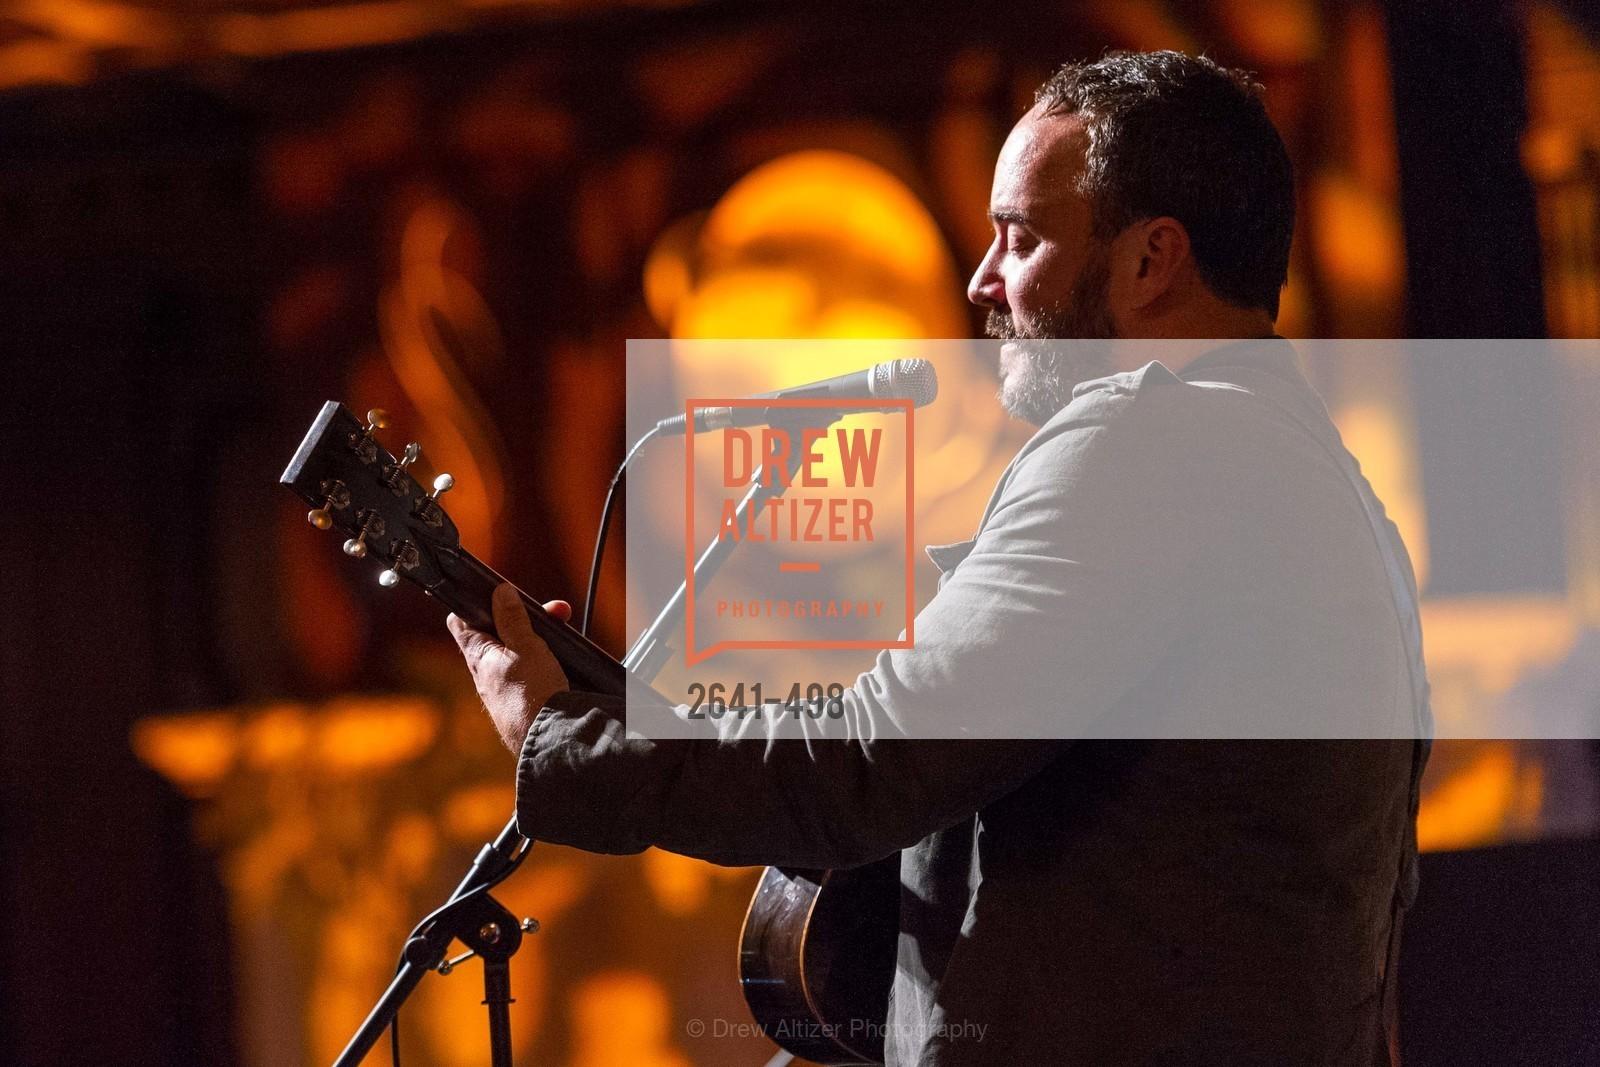 Performance By Dave Matthews, Photo #2641-498